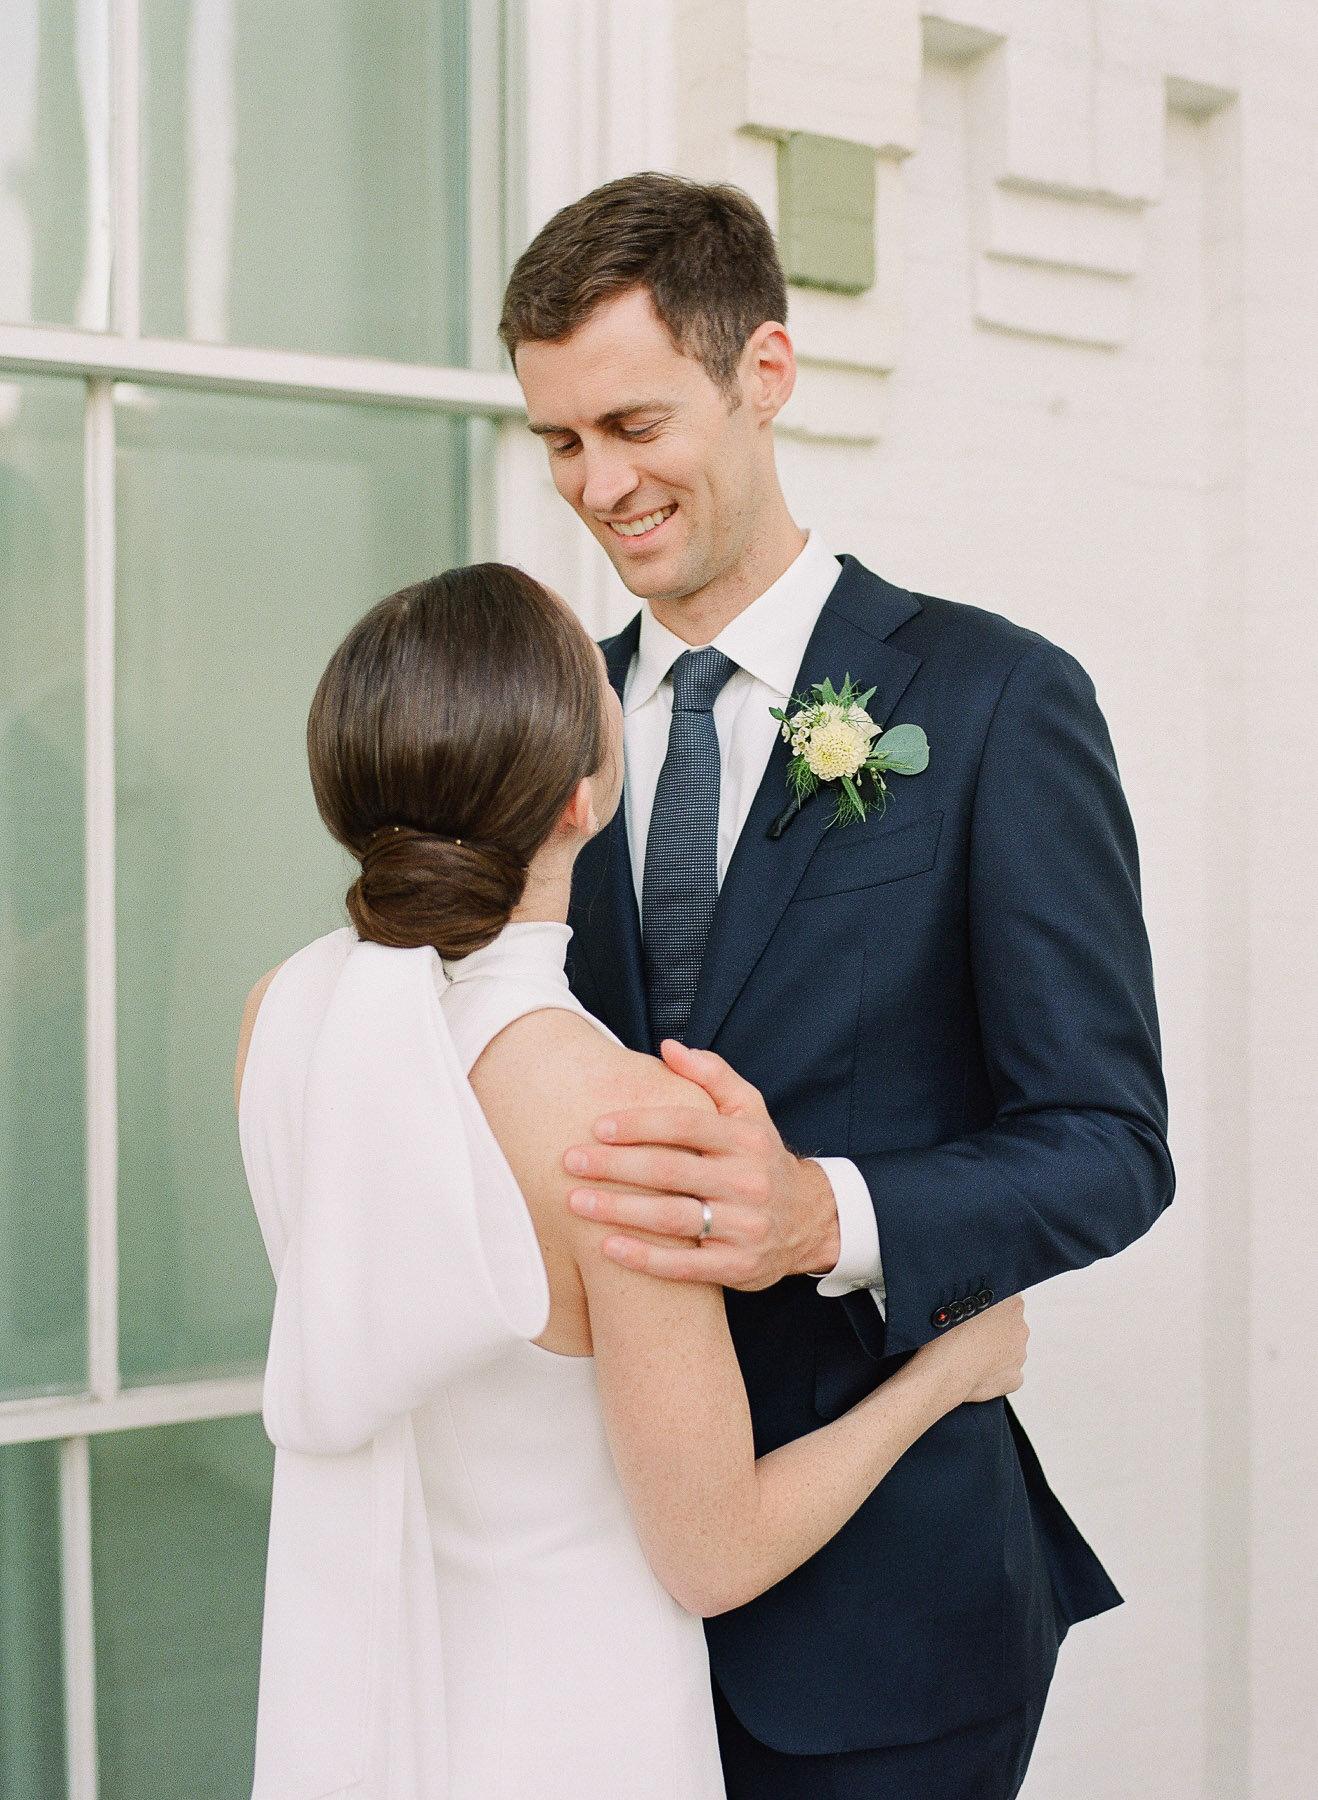 Adelphi Saratoga Wedding by Michelle Lange Photography-36.jpg